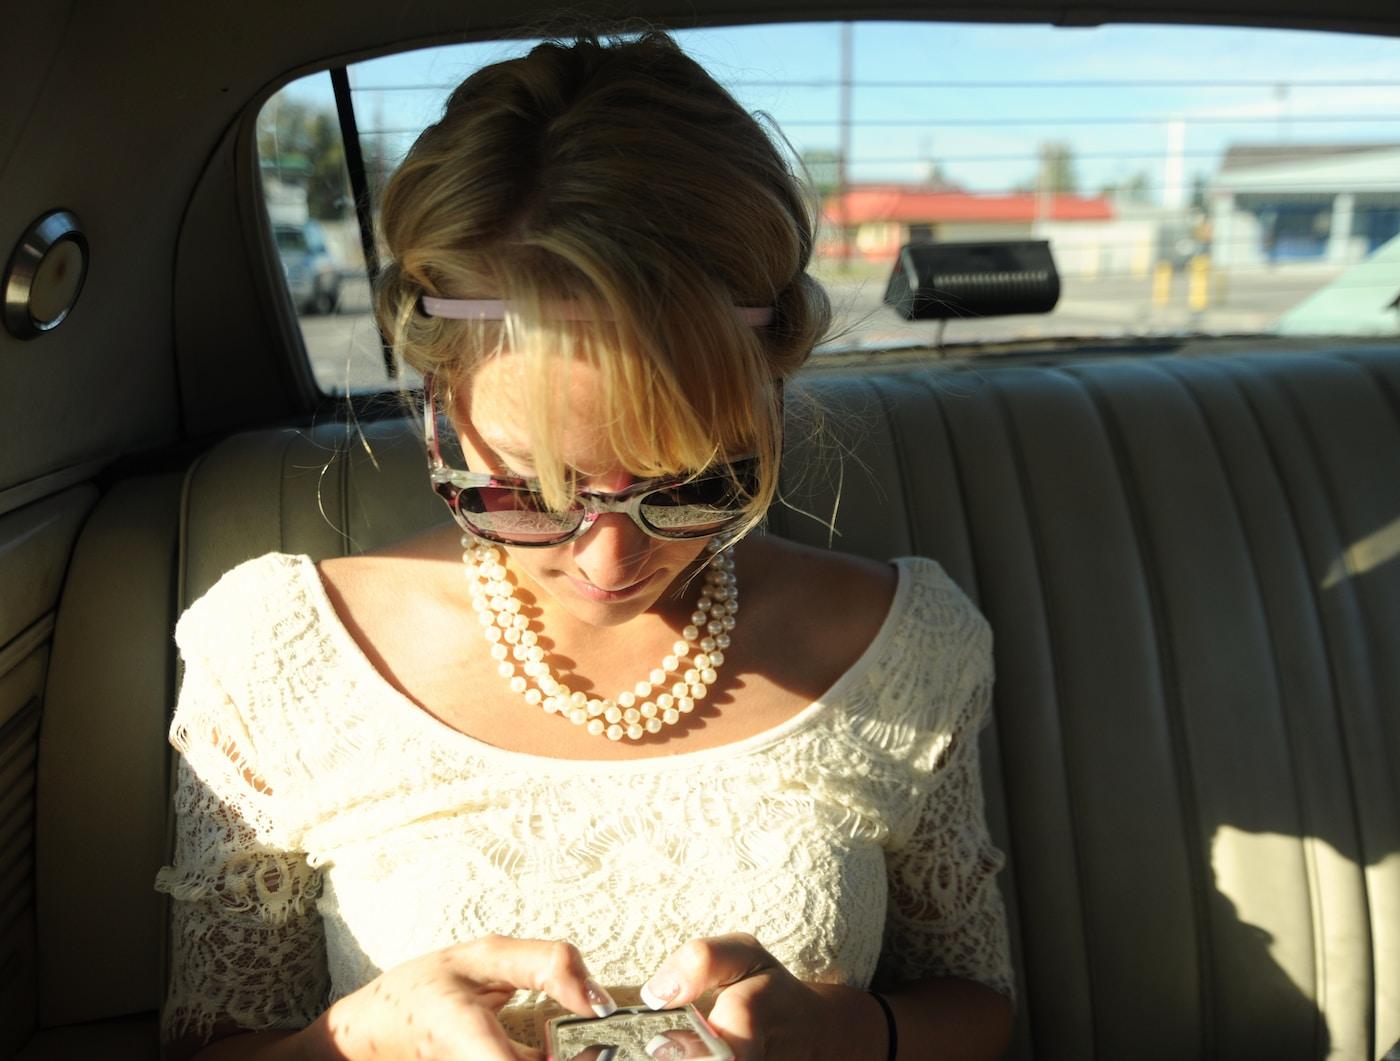 AdInMo. woman wearing white scoop-neck top inside vehicle